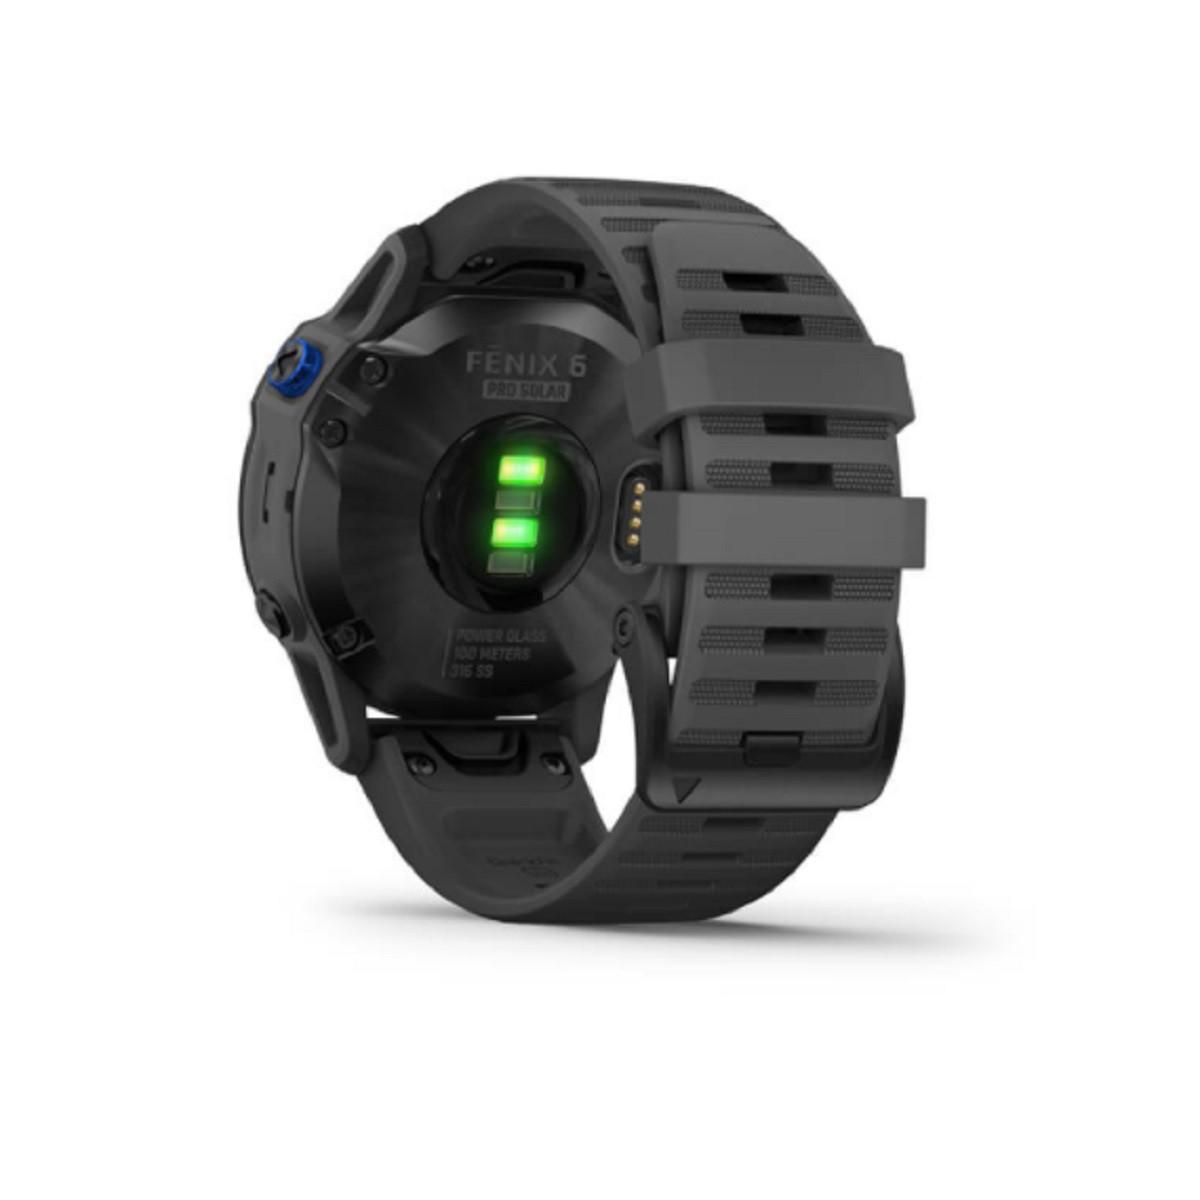 Gps Garmin Relógio Fenix 6 Pro Solar Power Glass Preto com Pulseira Cinza 010-02410-13